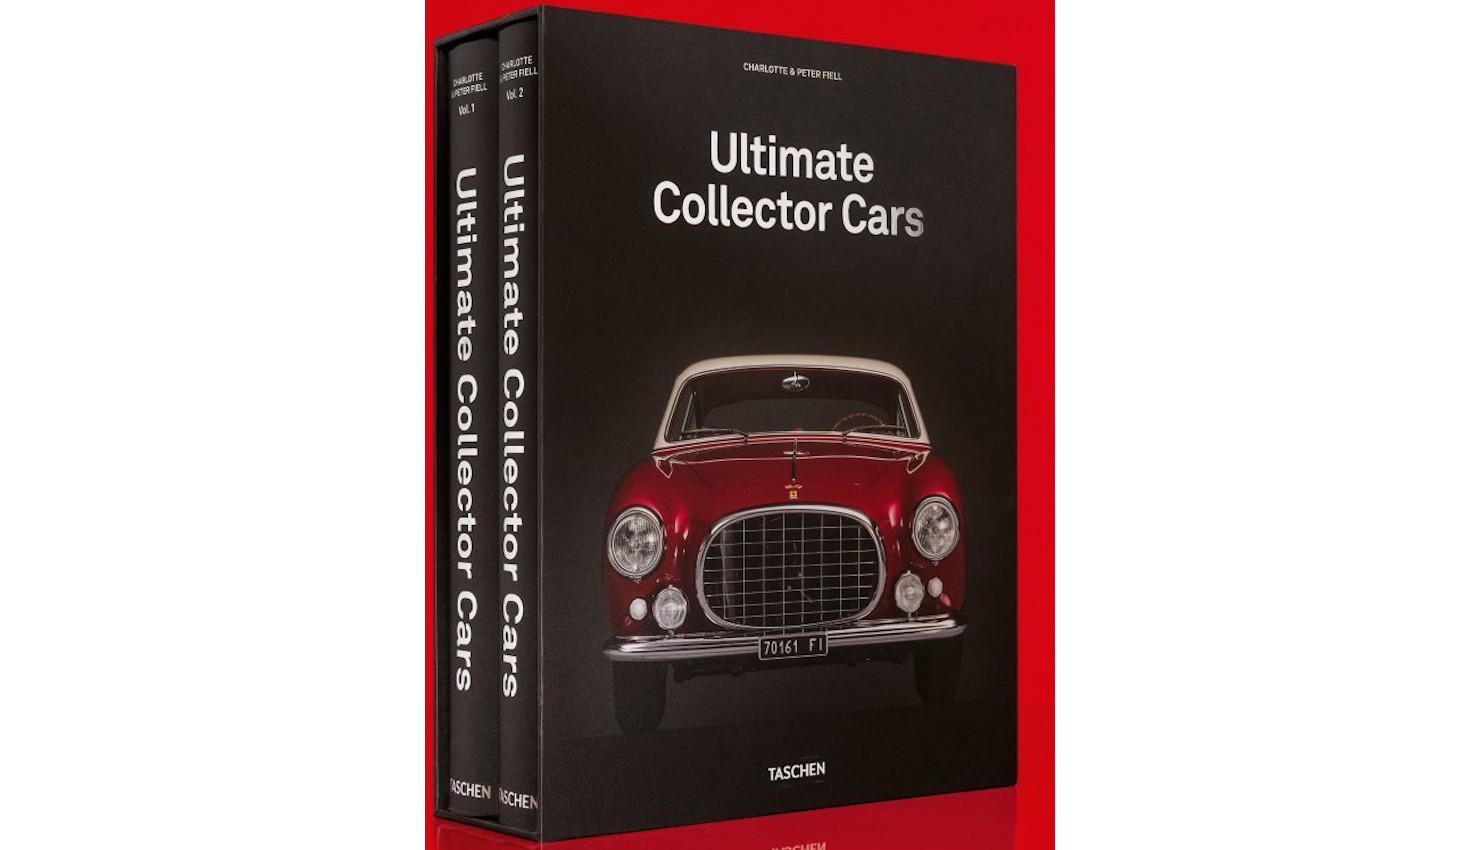 ultimatecollectorcars-taschen-magazinehorse